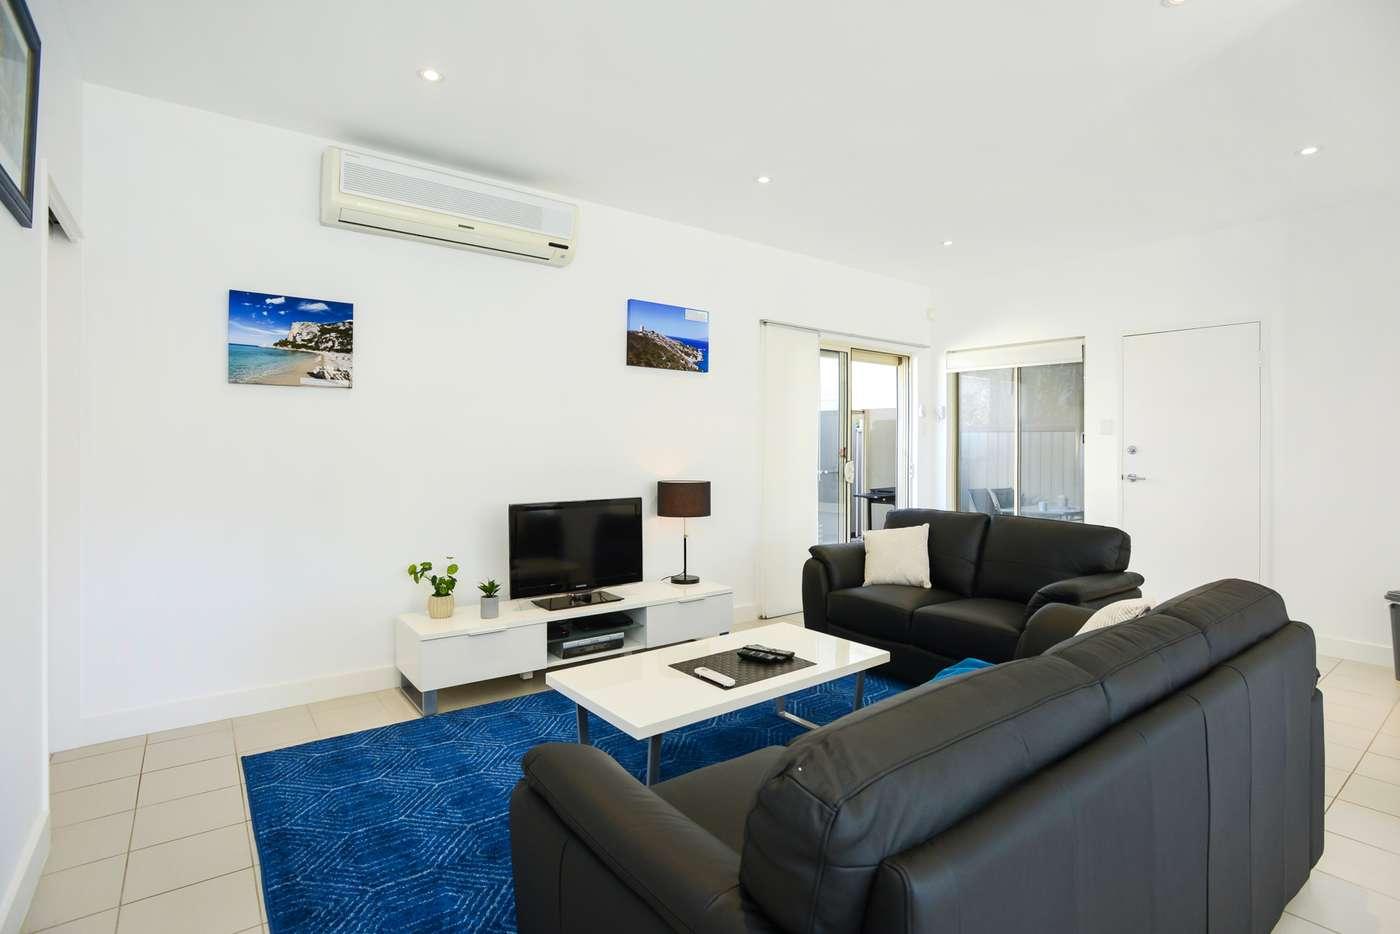 Sixth view of Homely house listing, 1/2 Whinnerah Avenue, Aldinga Beach SA 5173